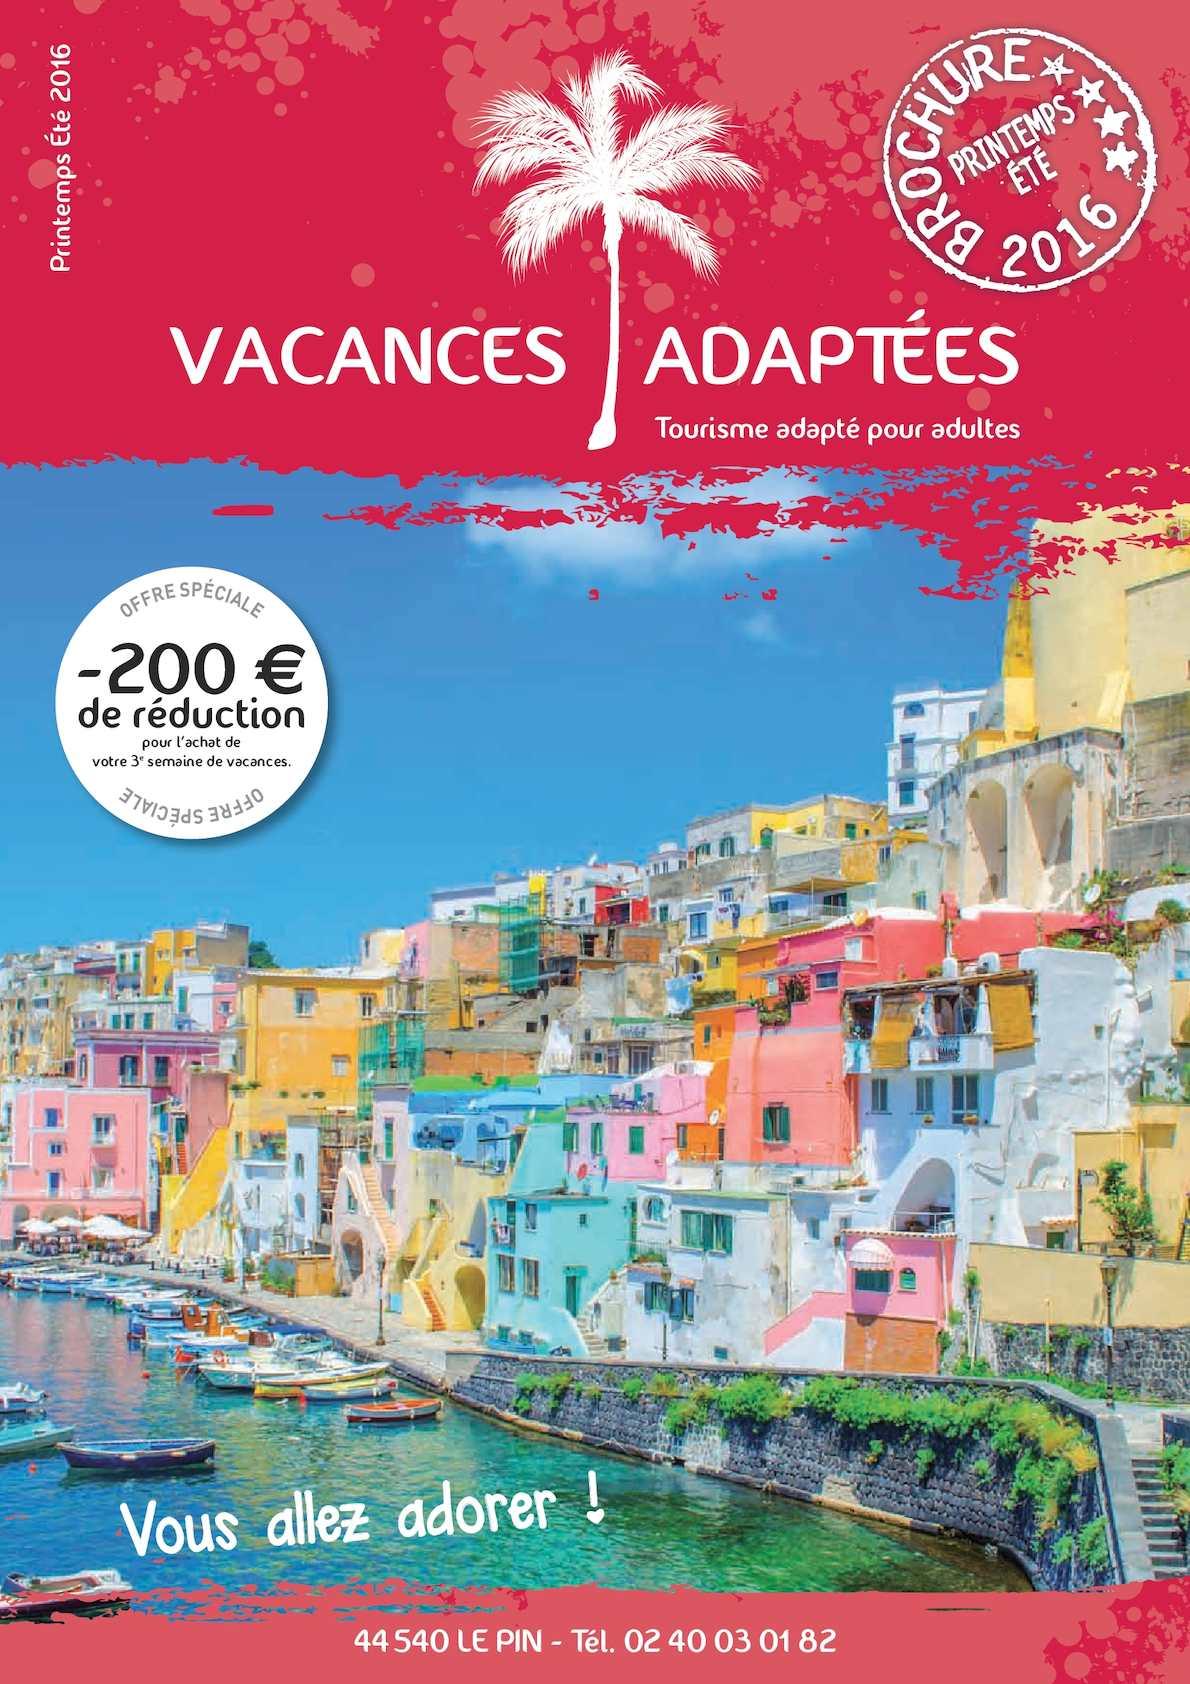 a7c336232535a0 Calaméo - Vacances Brochures Été 2016